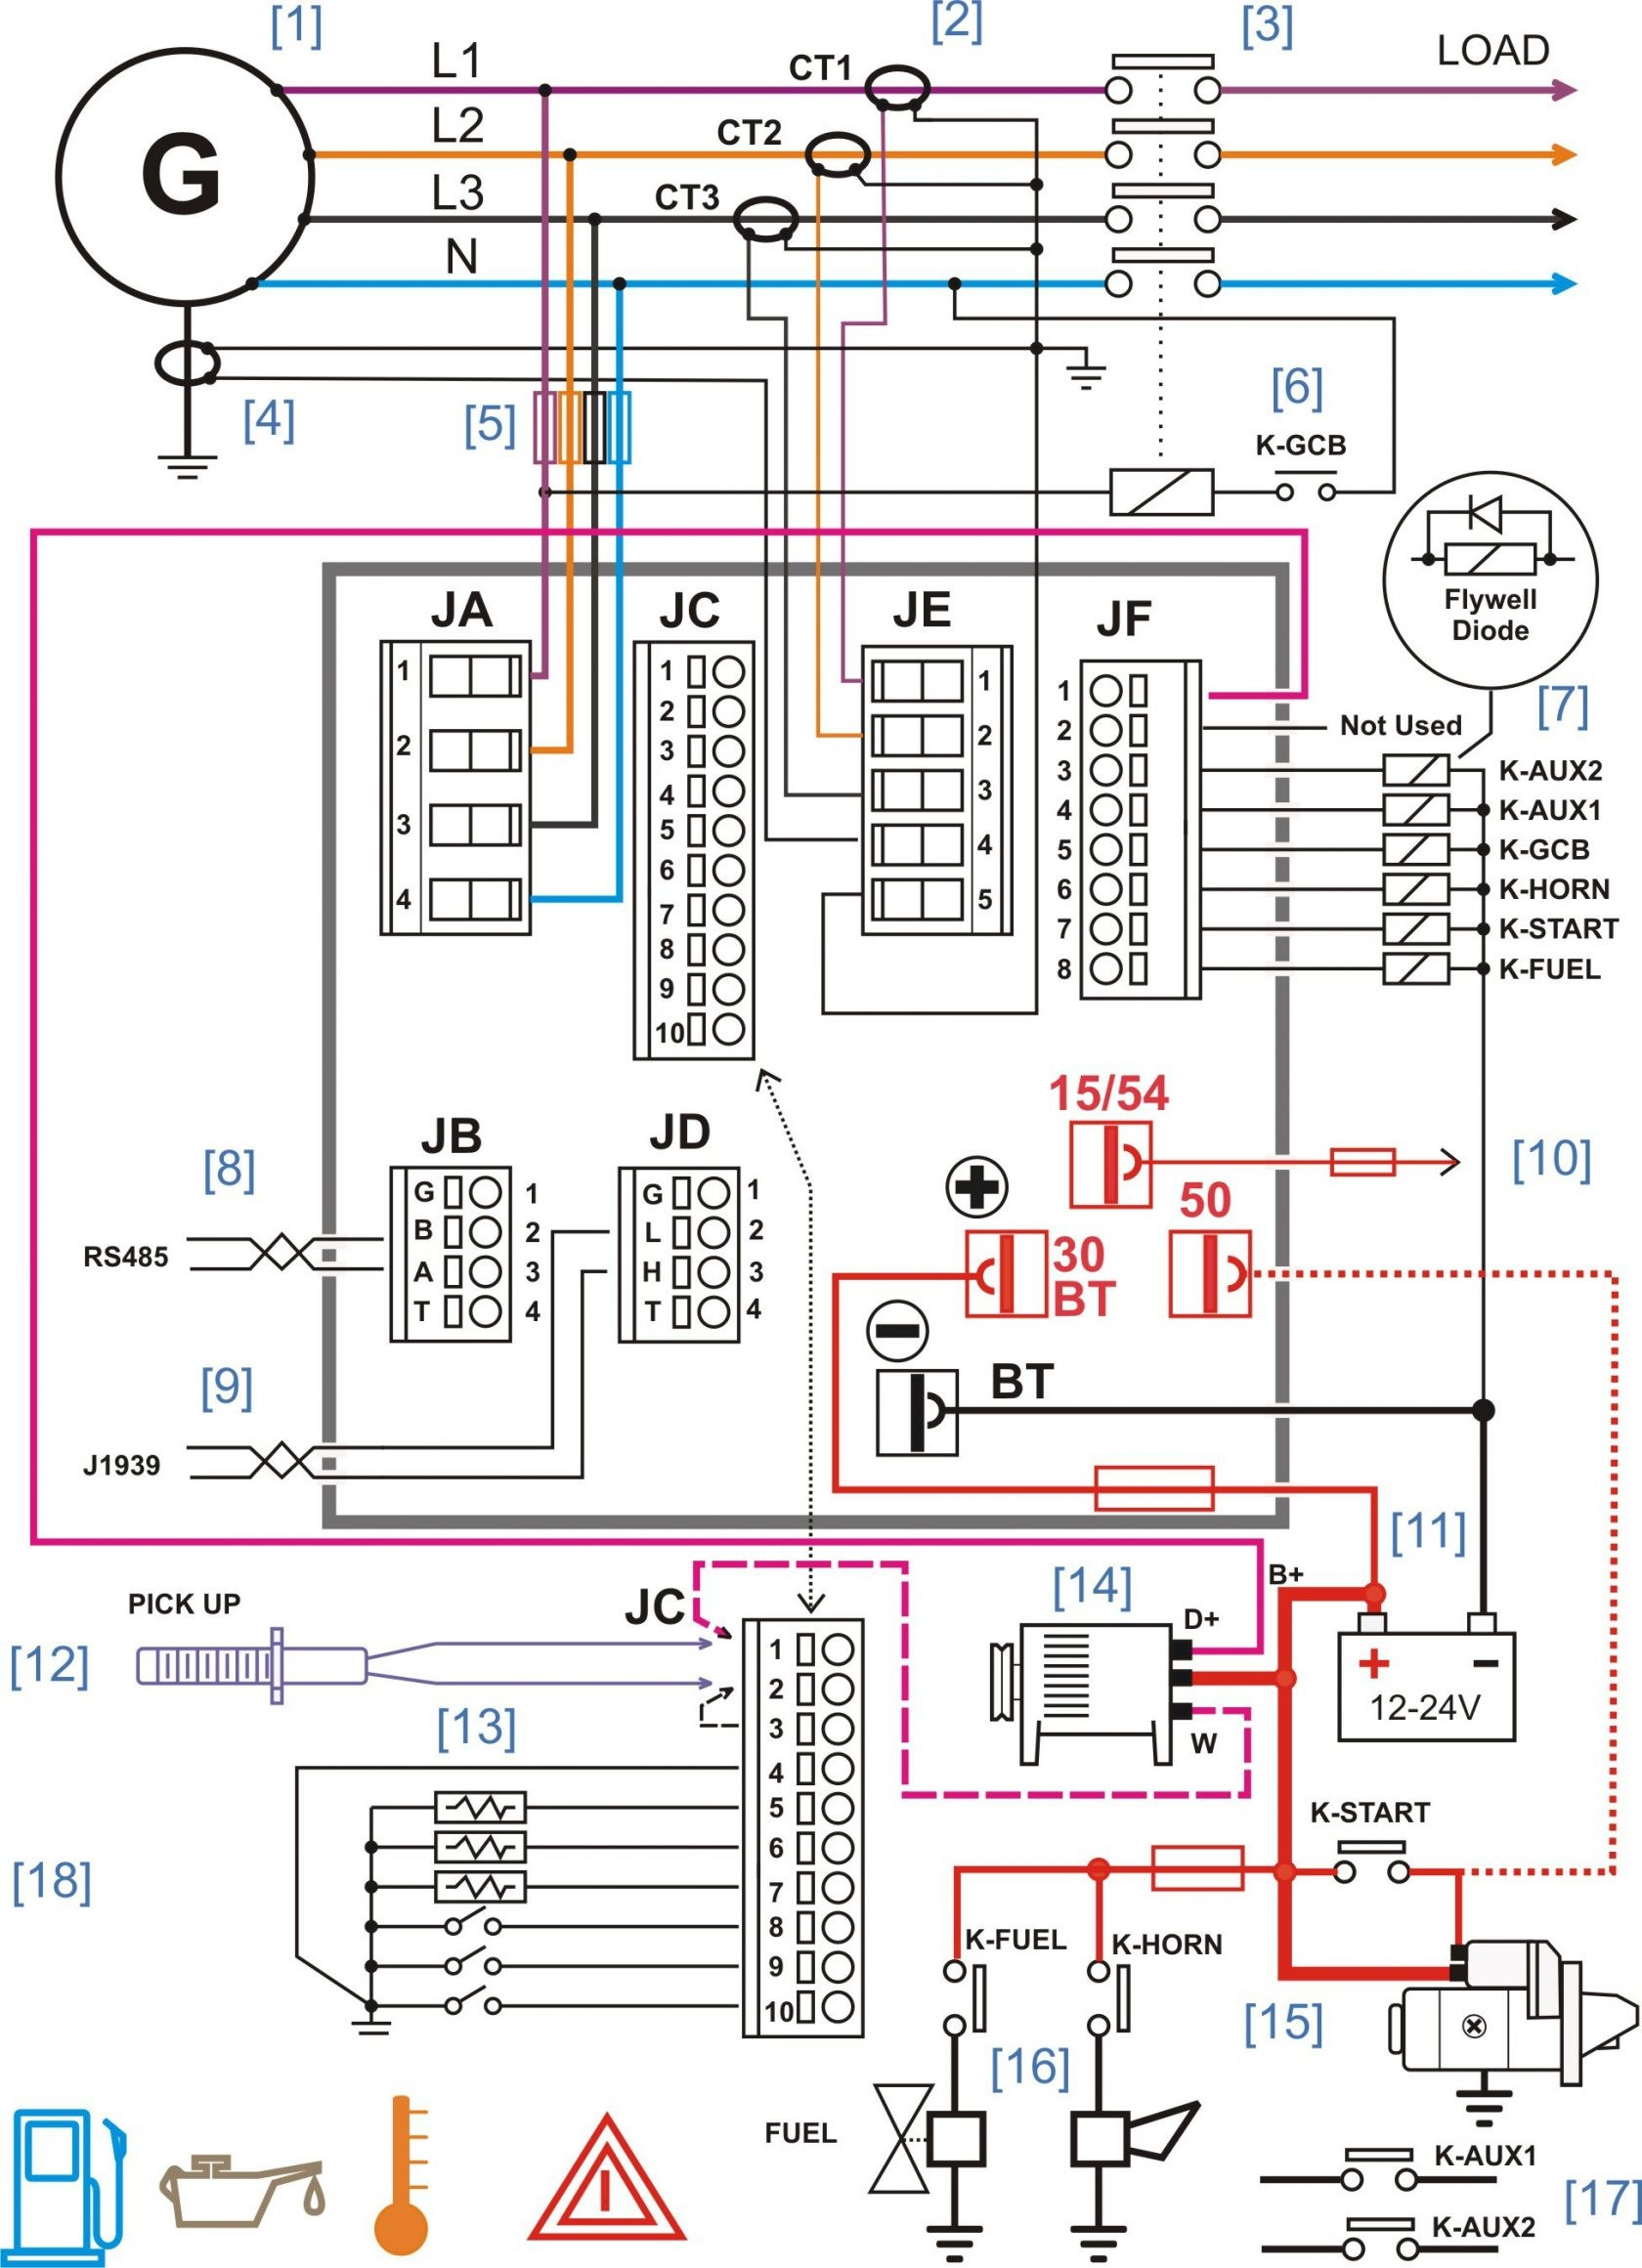 WRG-5047] Mack Radio Wire Diagram on mack relay diagram, mack parts diagram, mack transmission diagram, mack fuel system diagram, mack suspension, mack hvac diagram, mack engine diagram, mack motor diagram, mack steering diagram, mack rear end diagram, mack pump diagram, mack fuse diagram,